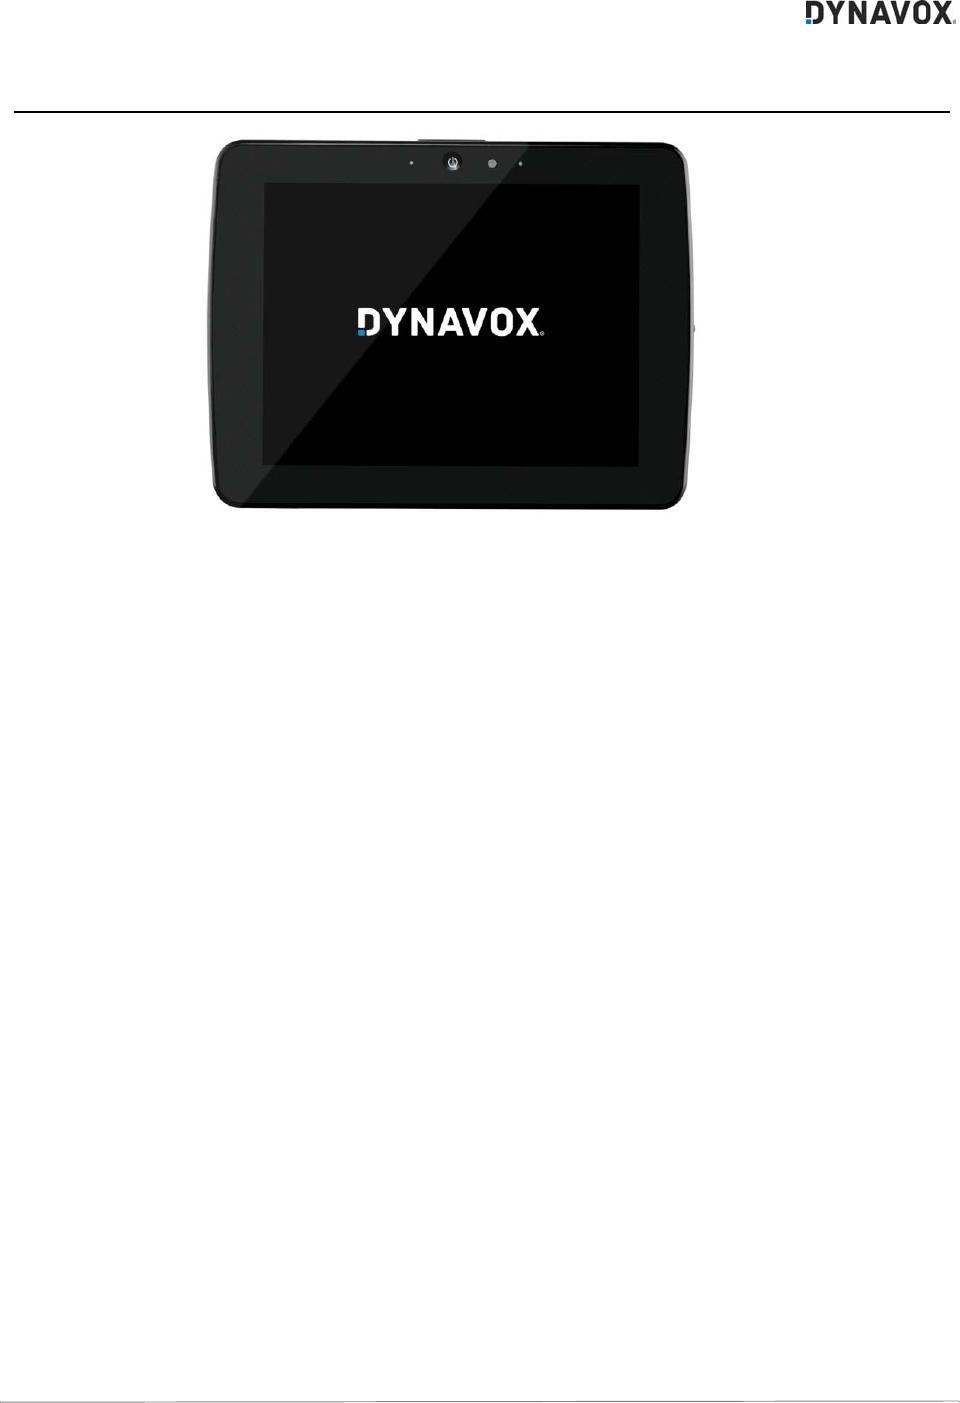 Tobii Dynavox T15 DynaVox T15 User Manual S6 DynaVoxT10 T15 Book